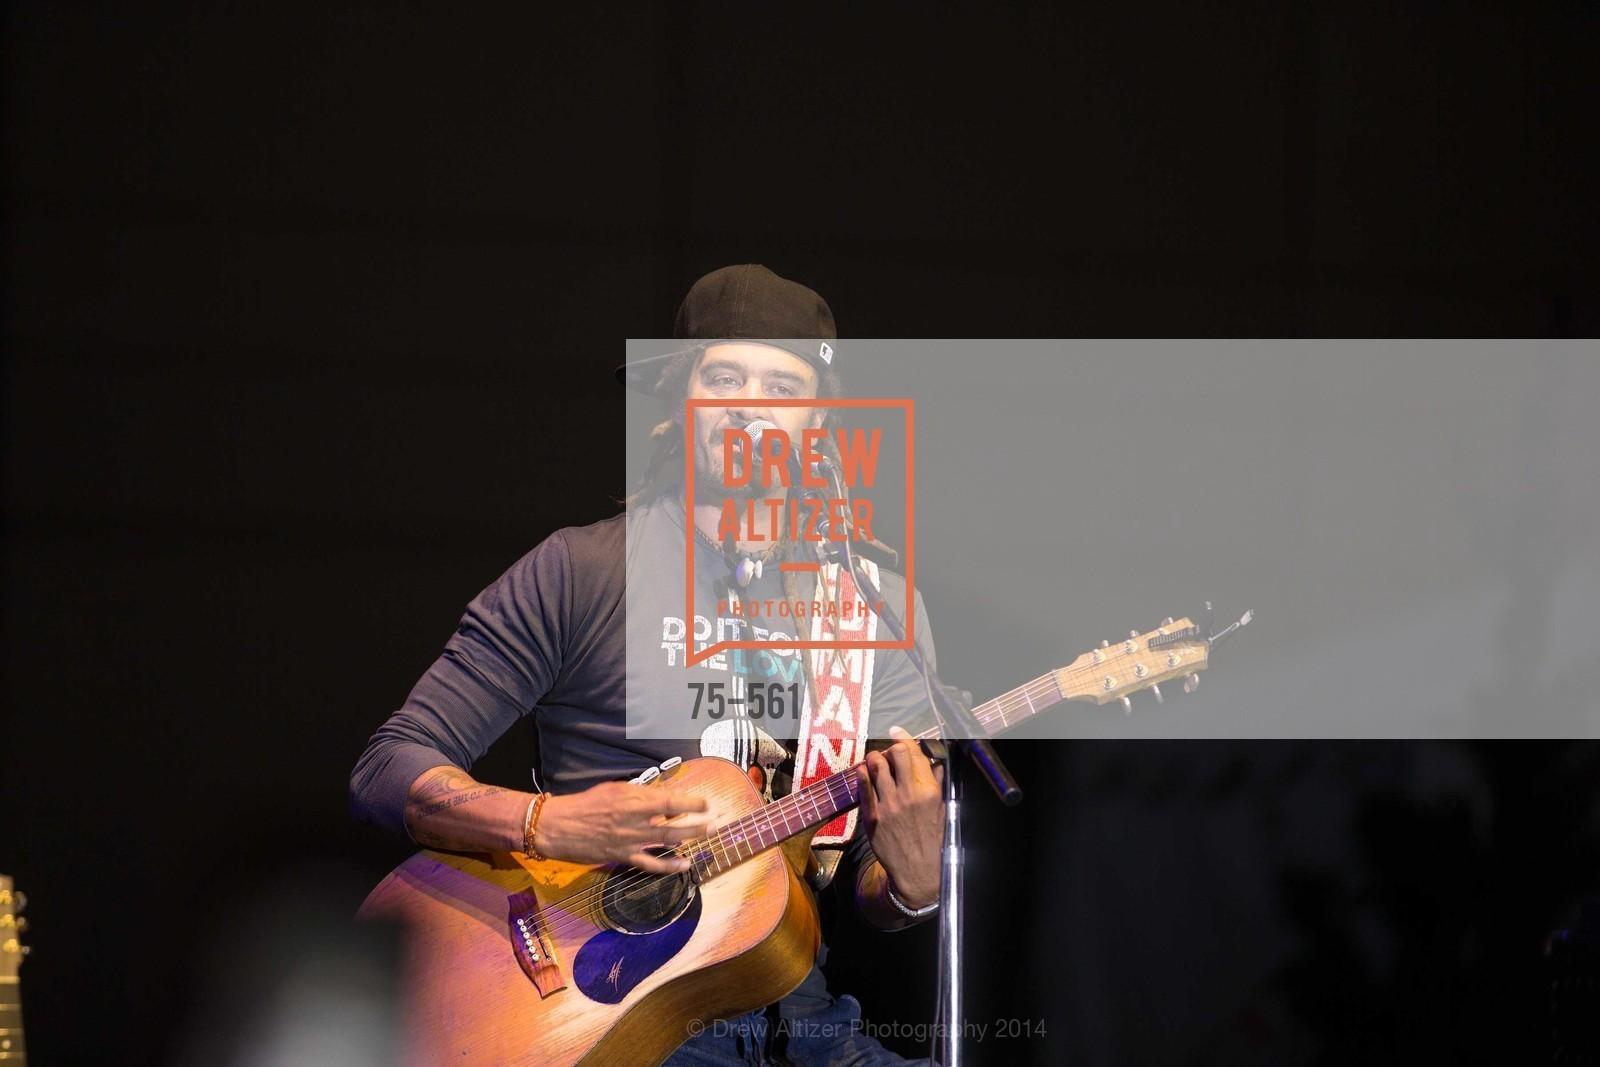 Performance By Michael Franti, Photo #75-561